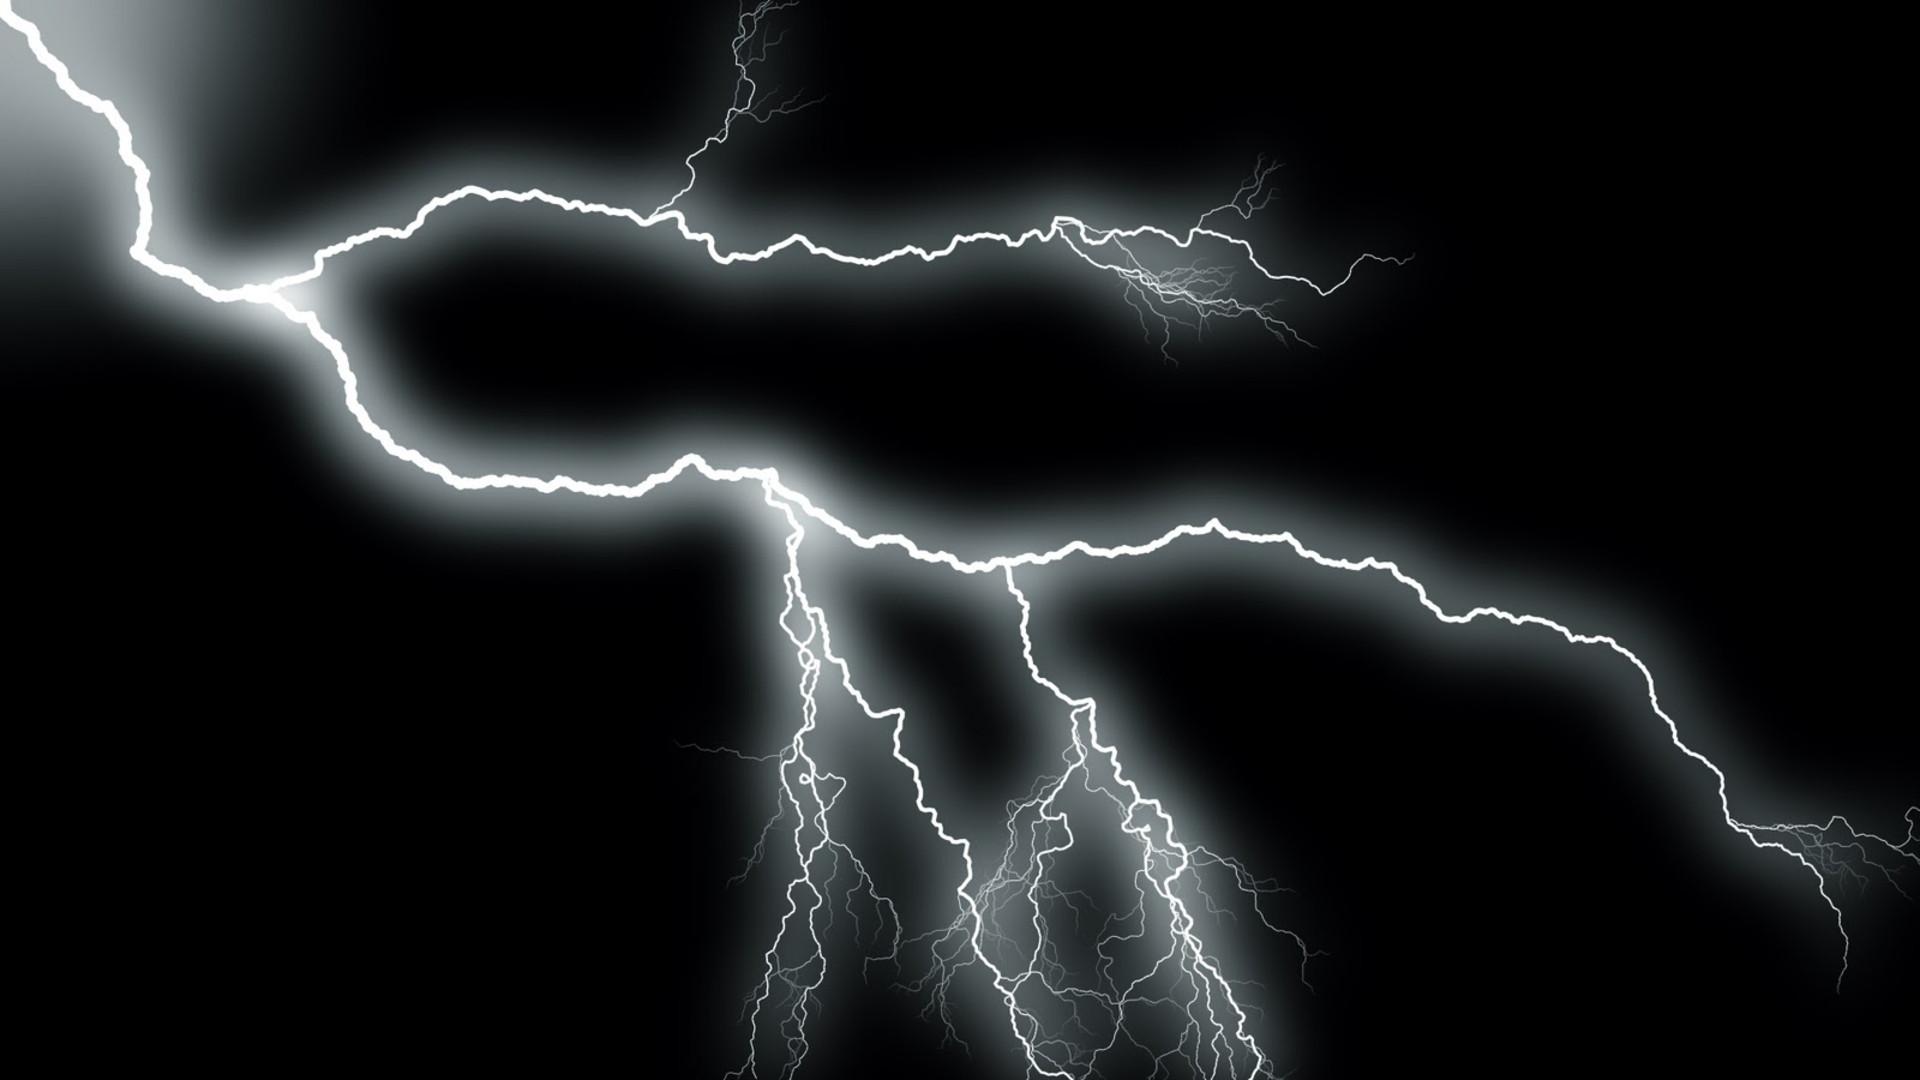 Free Lightning Bolt Download Free Clip Art Free Clip Art